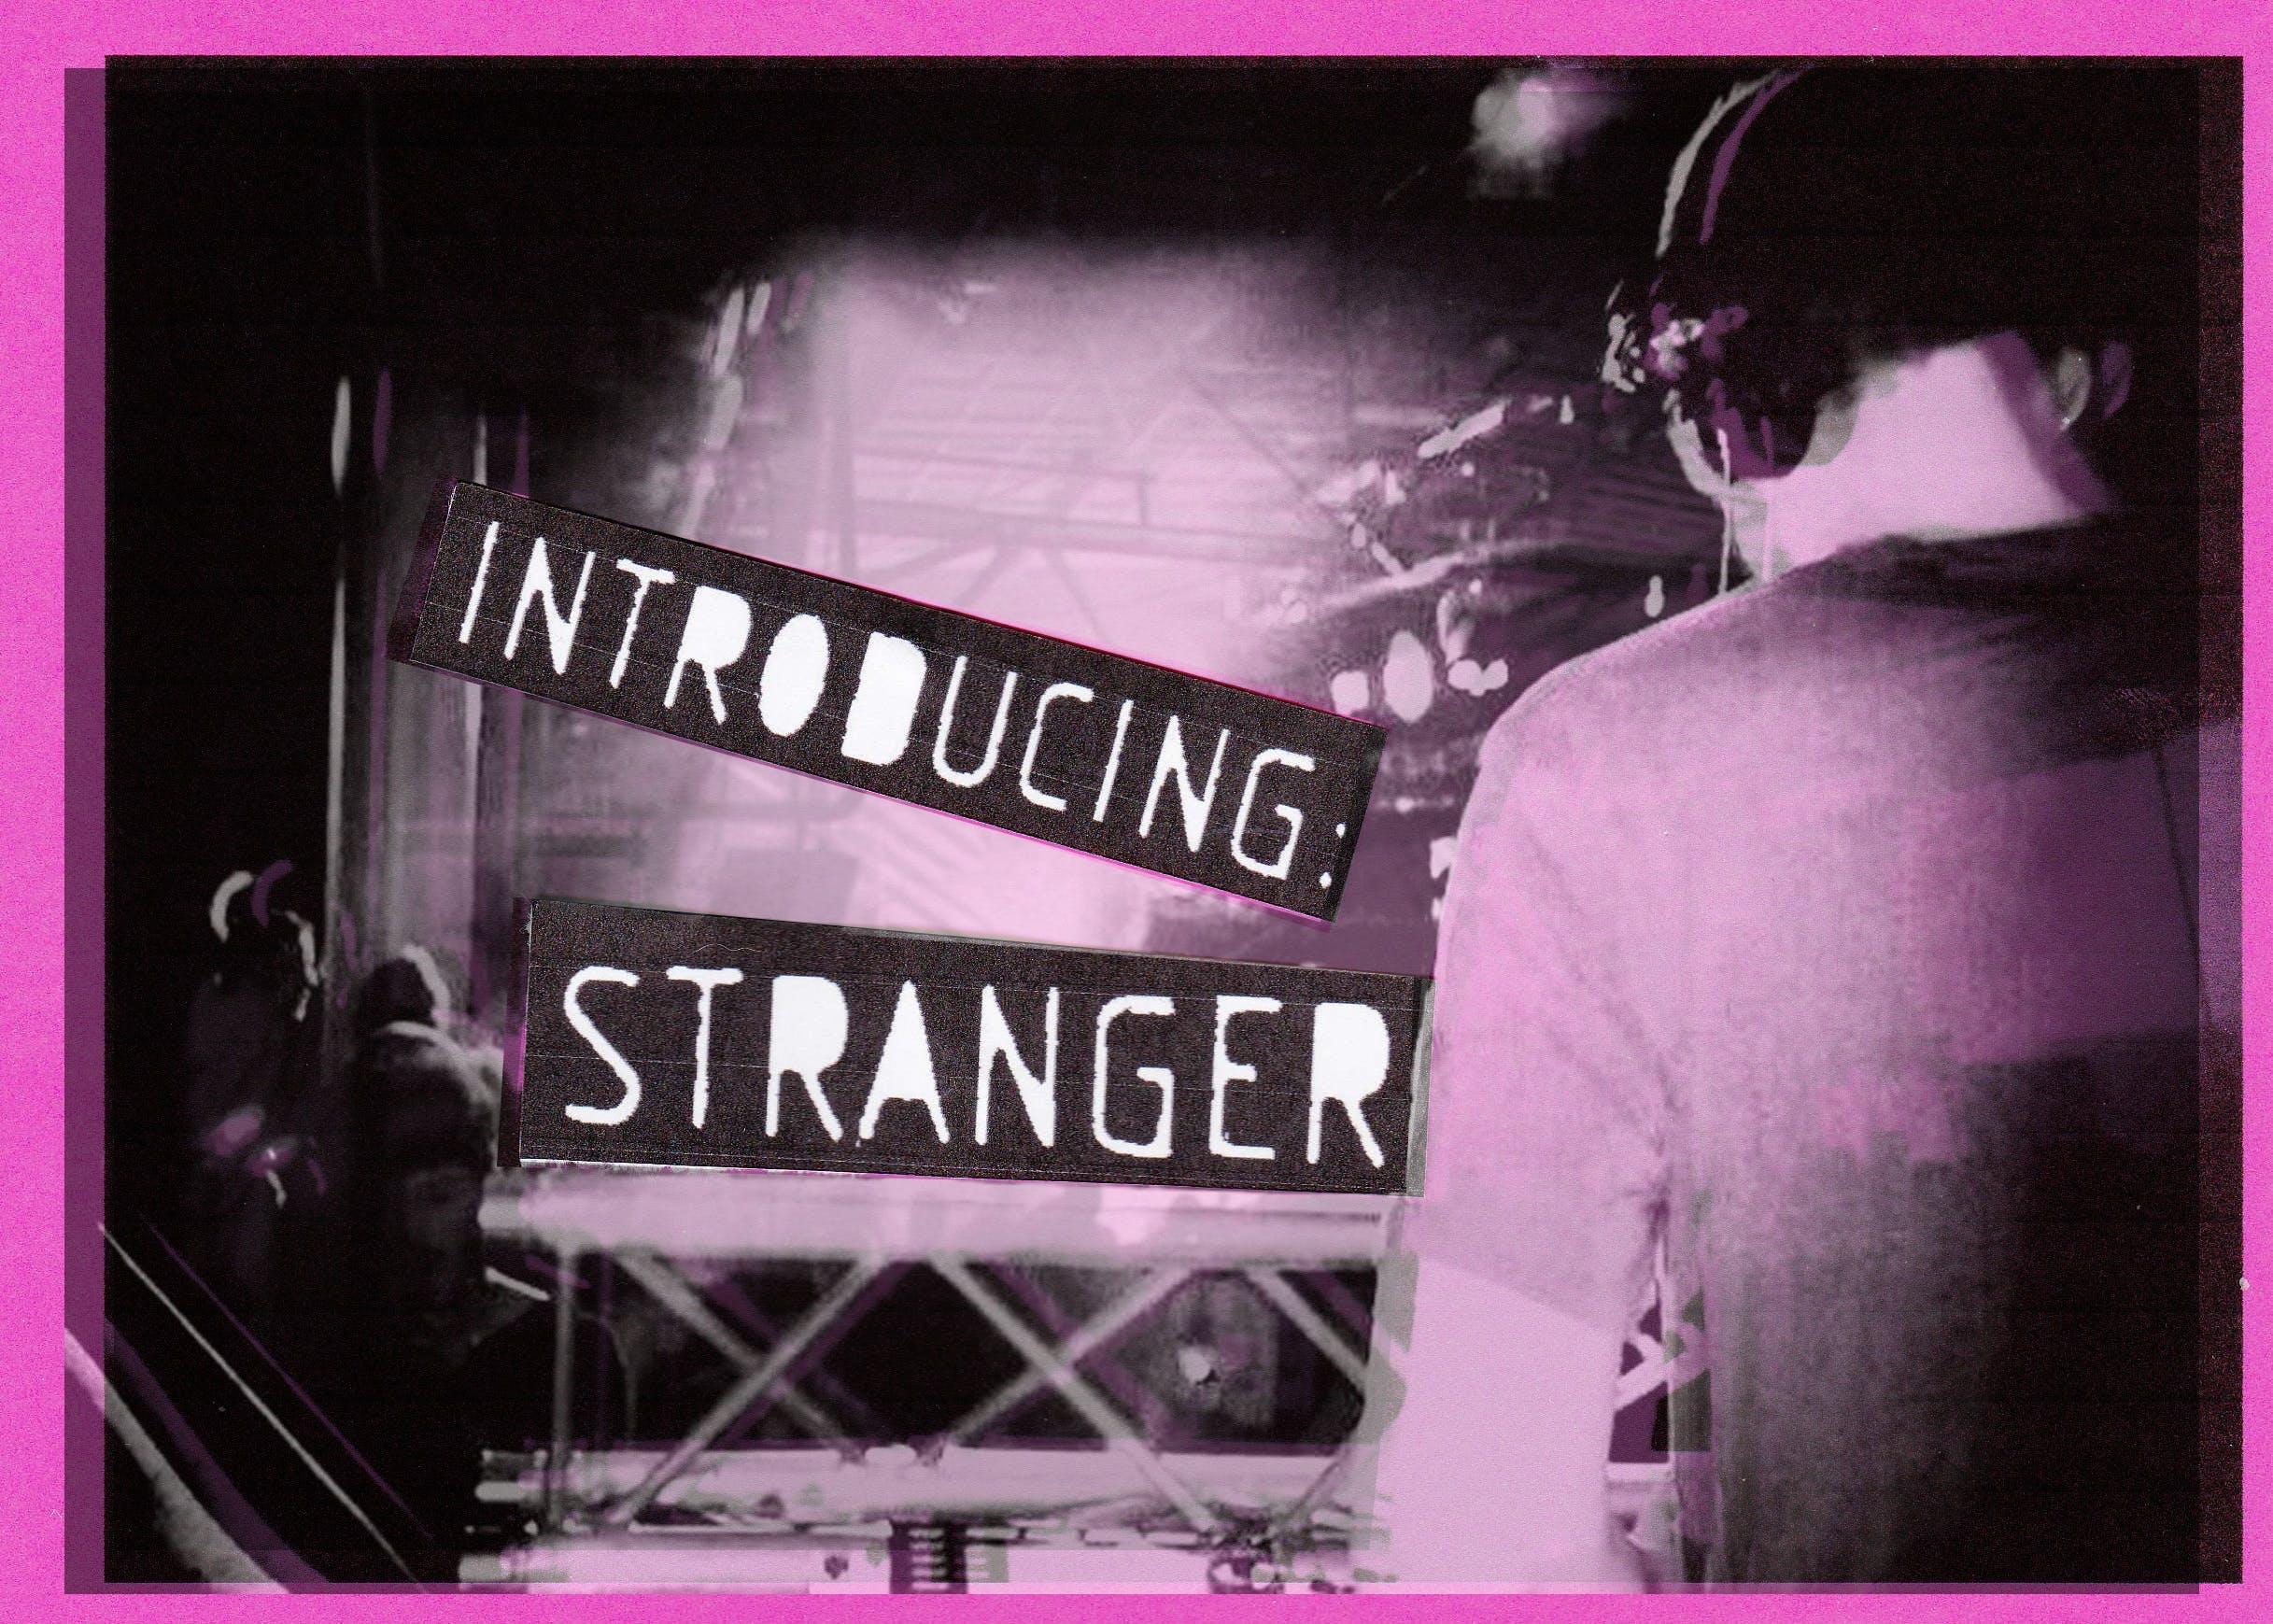 Introducing: Stranger